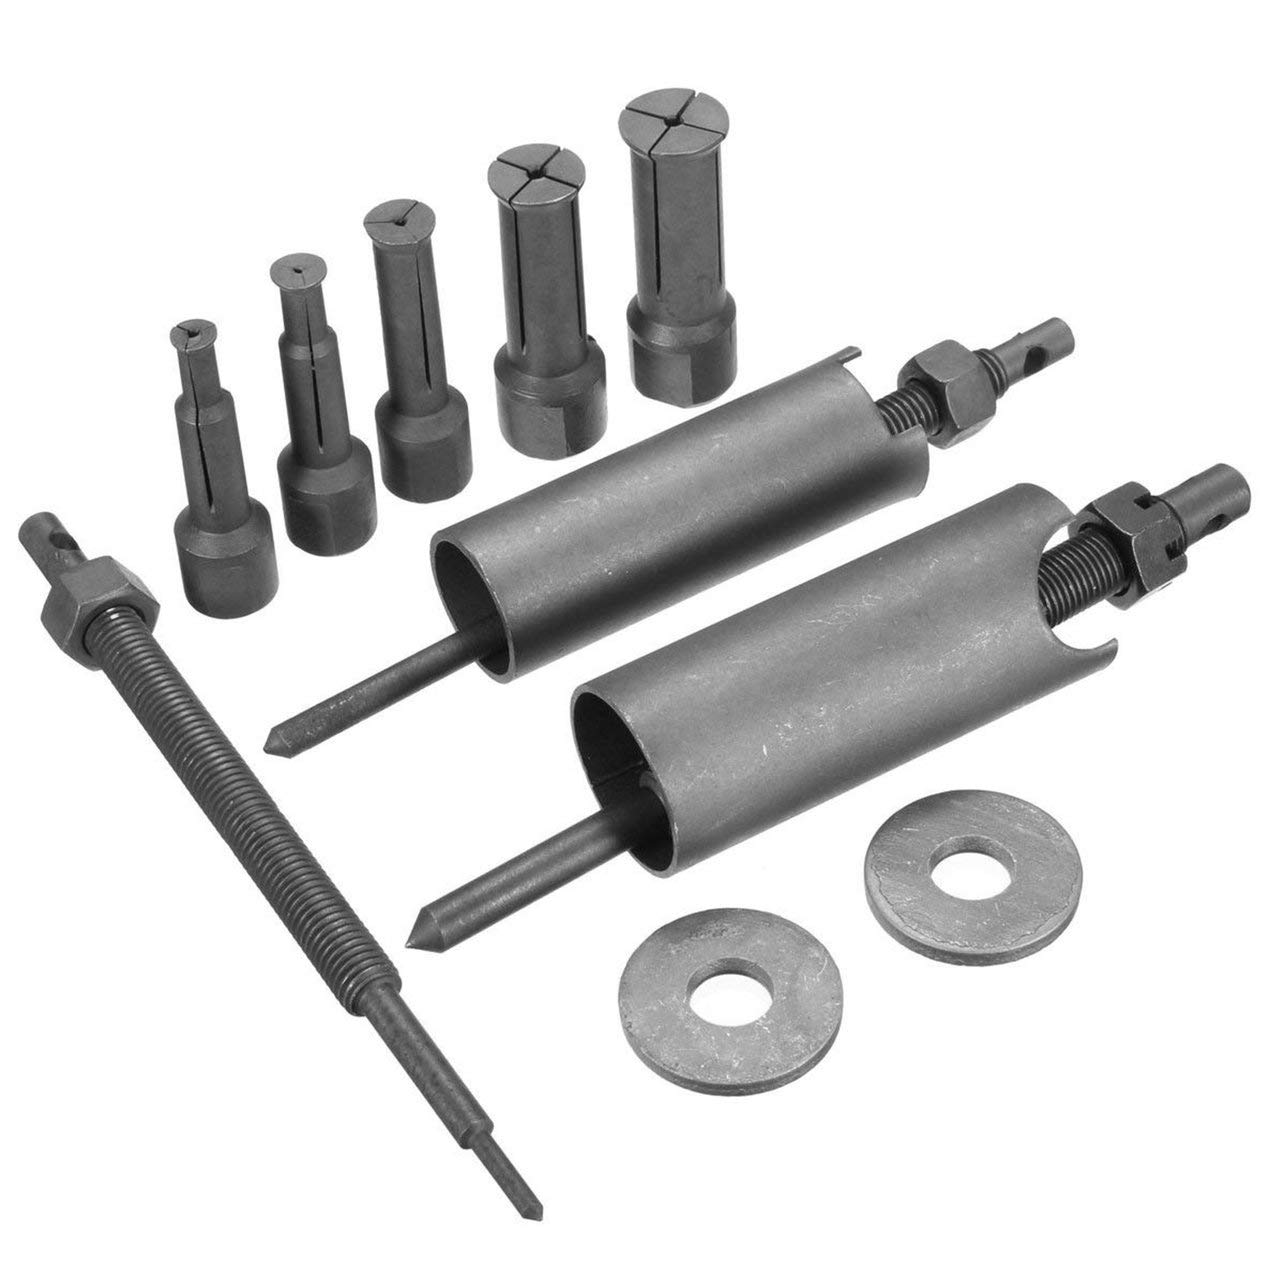 grau Motorrad-Box Innenlager Spezielle Werkzeuglager Remover Lagerabzieher Auto Getriebe Remover Pulling Extractor Tool